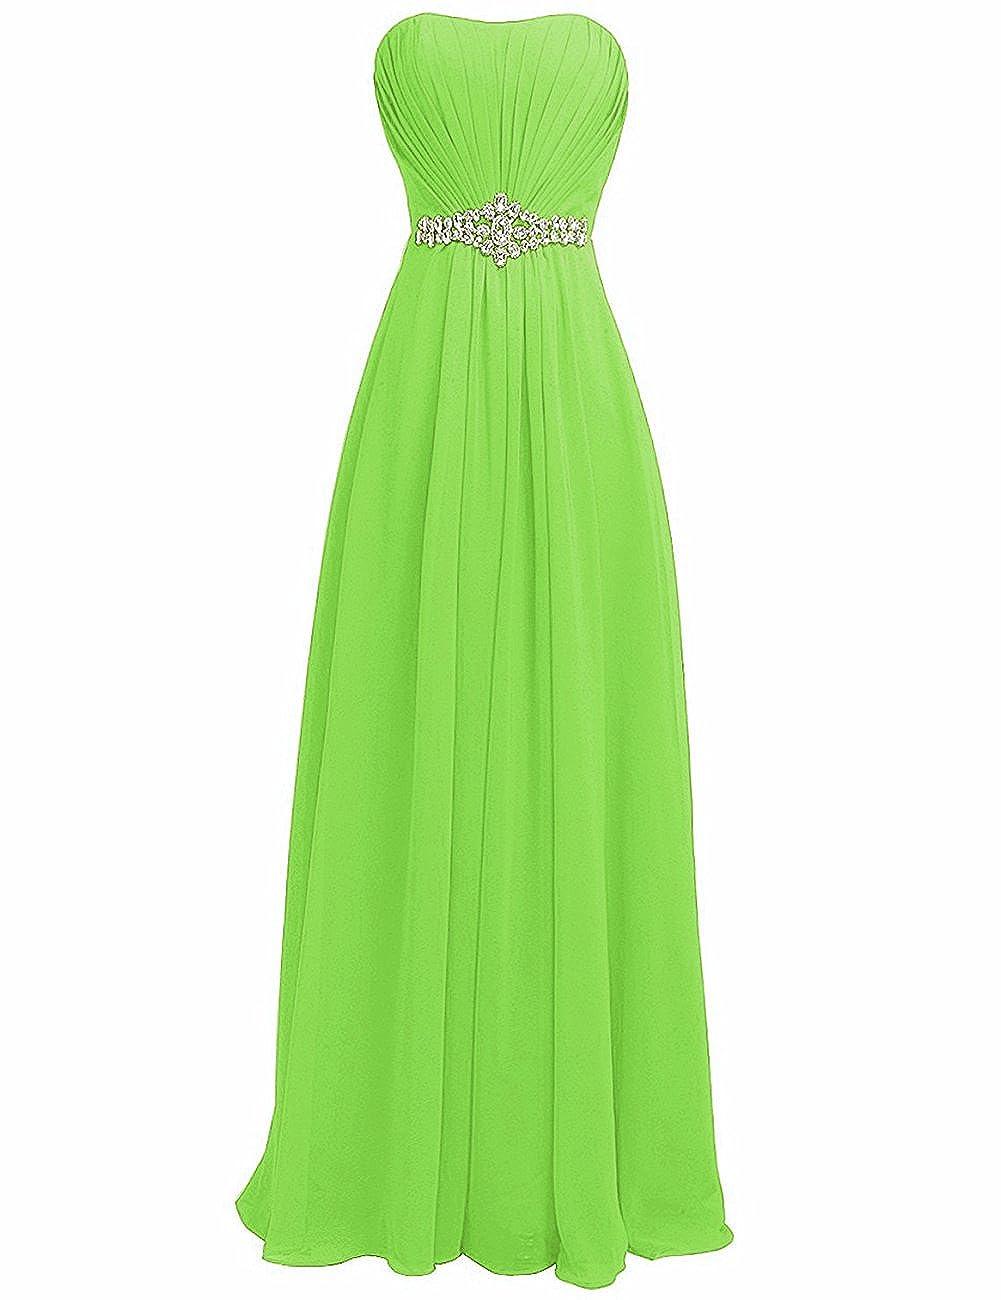 Lemon Green H.S.D Women's Strapless Rhinestone Sash Long Bridesmaid Dress Evening Gown